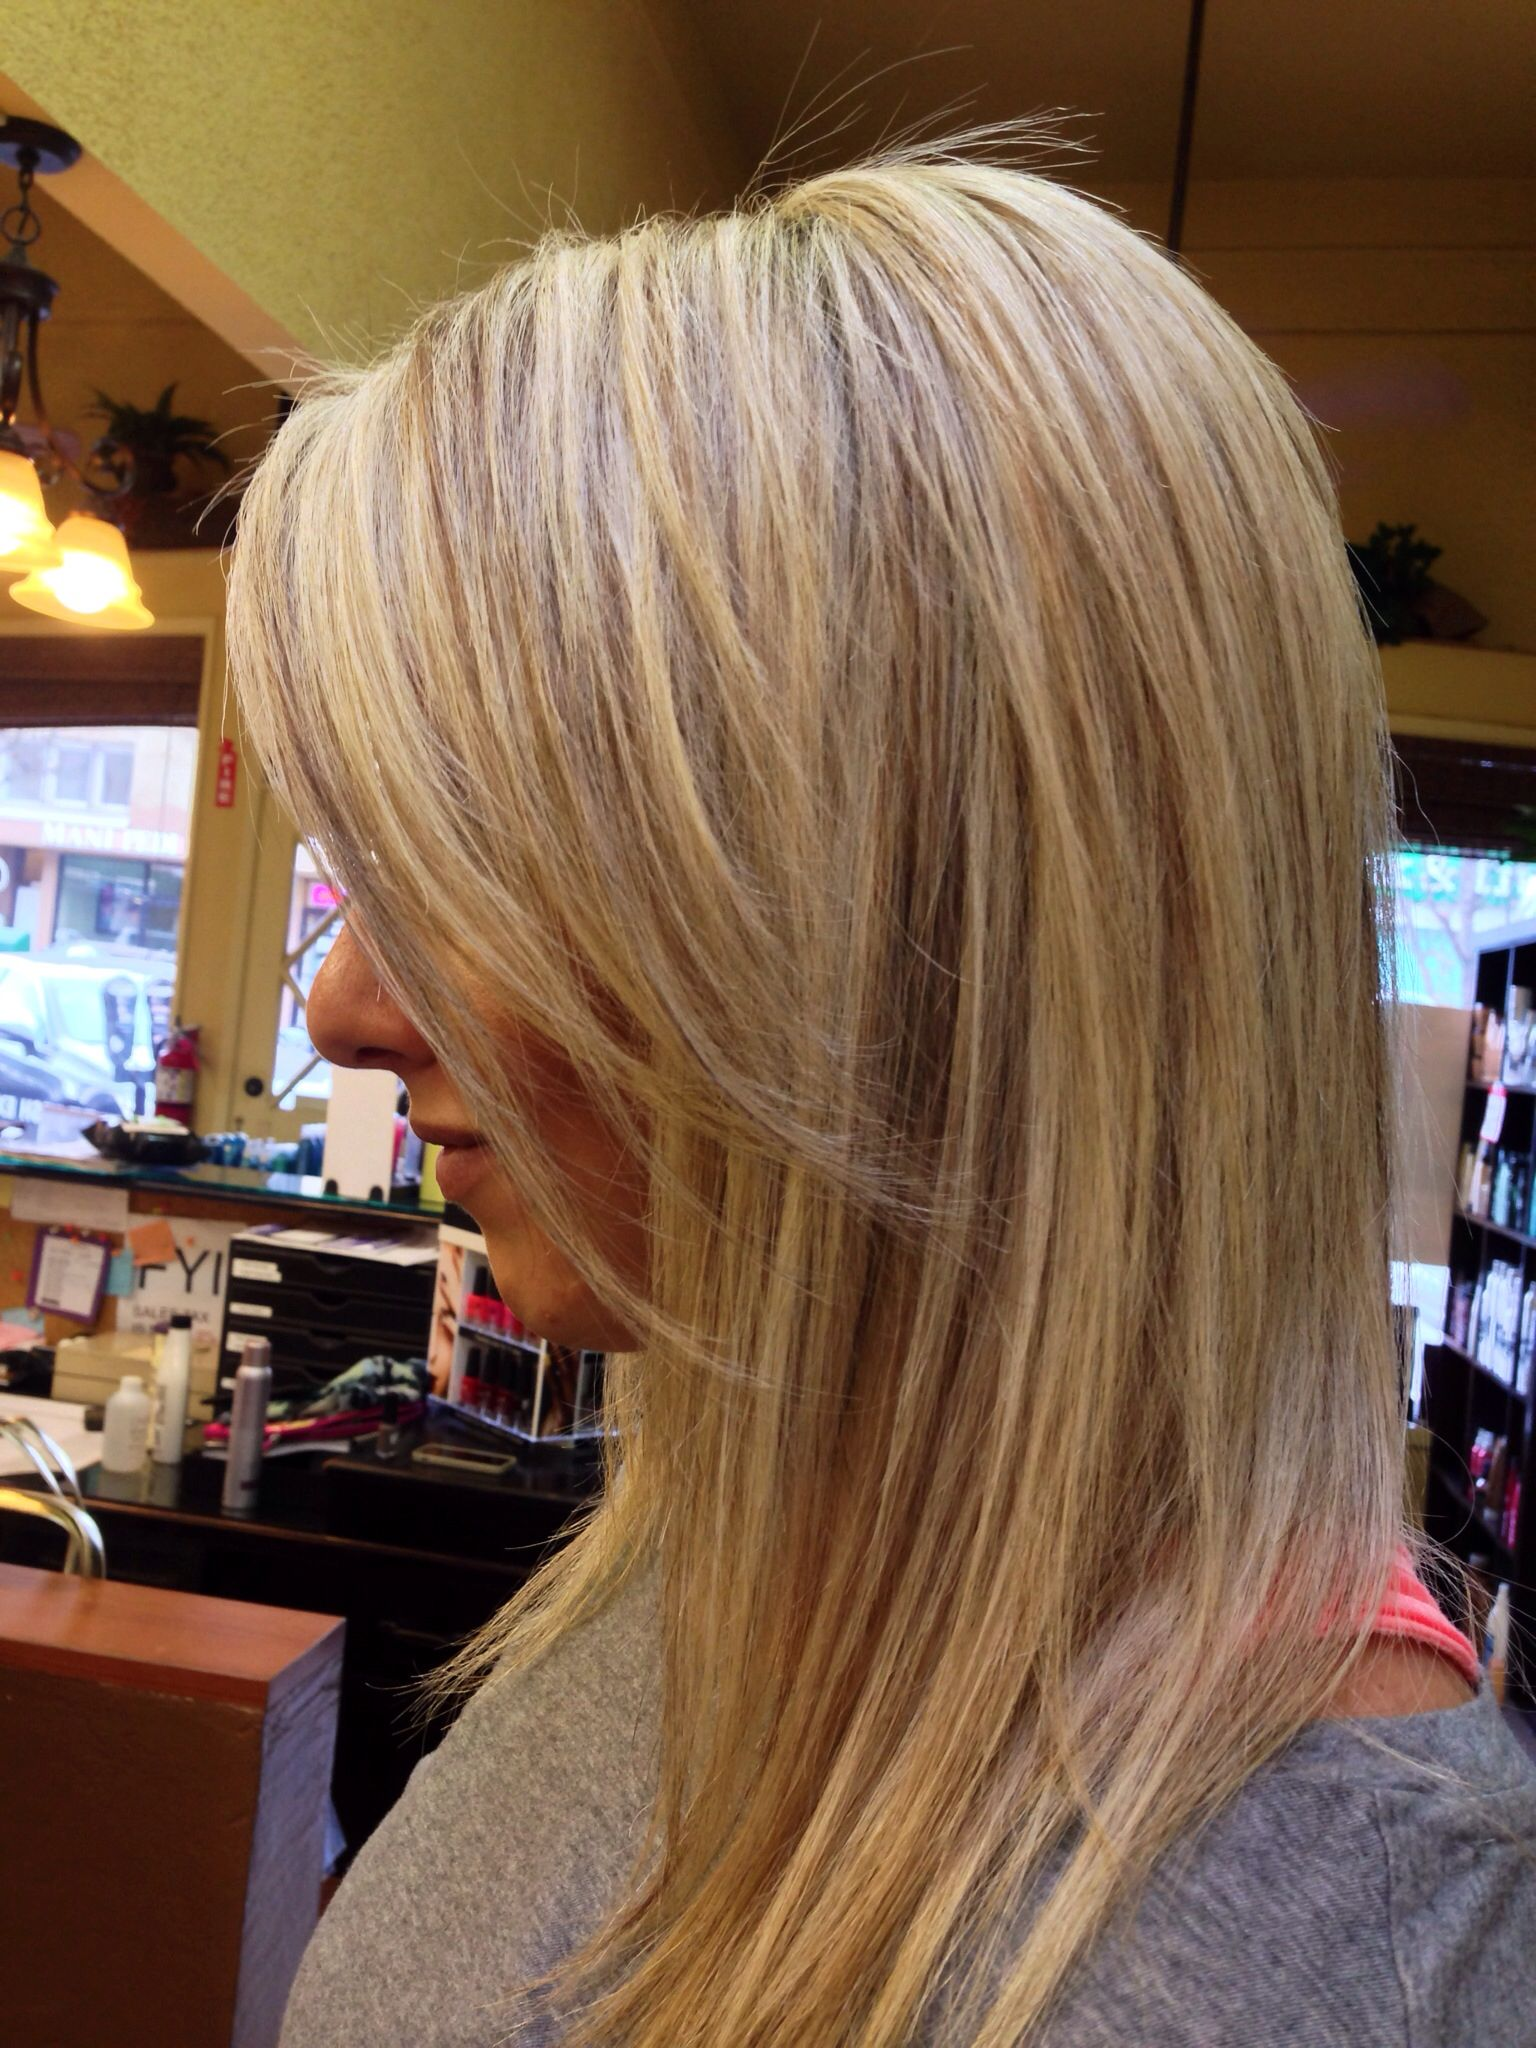 Blonde Highlights With Beige Lowlights Color Jessie At Trenz Salon